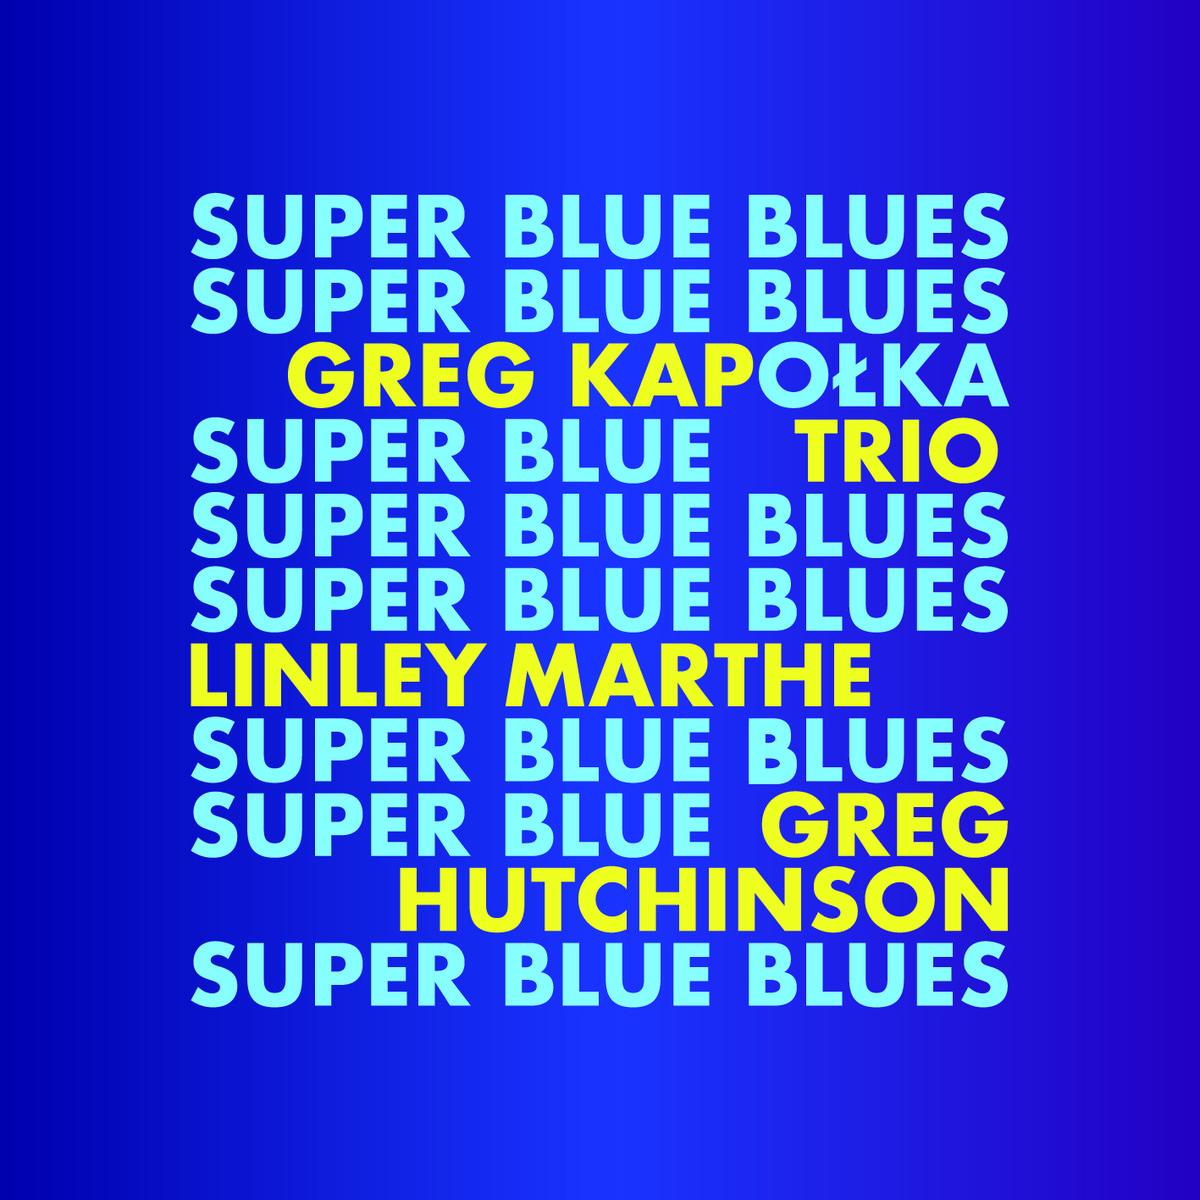 Kapołka Greg Trio – Super Blue Blues